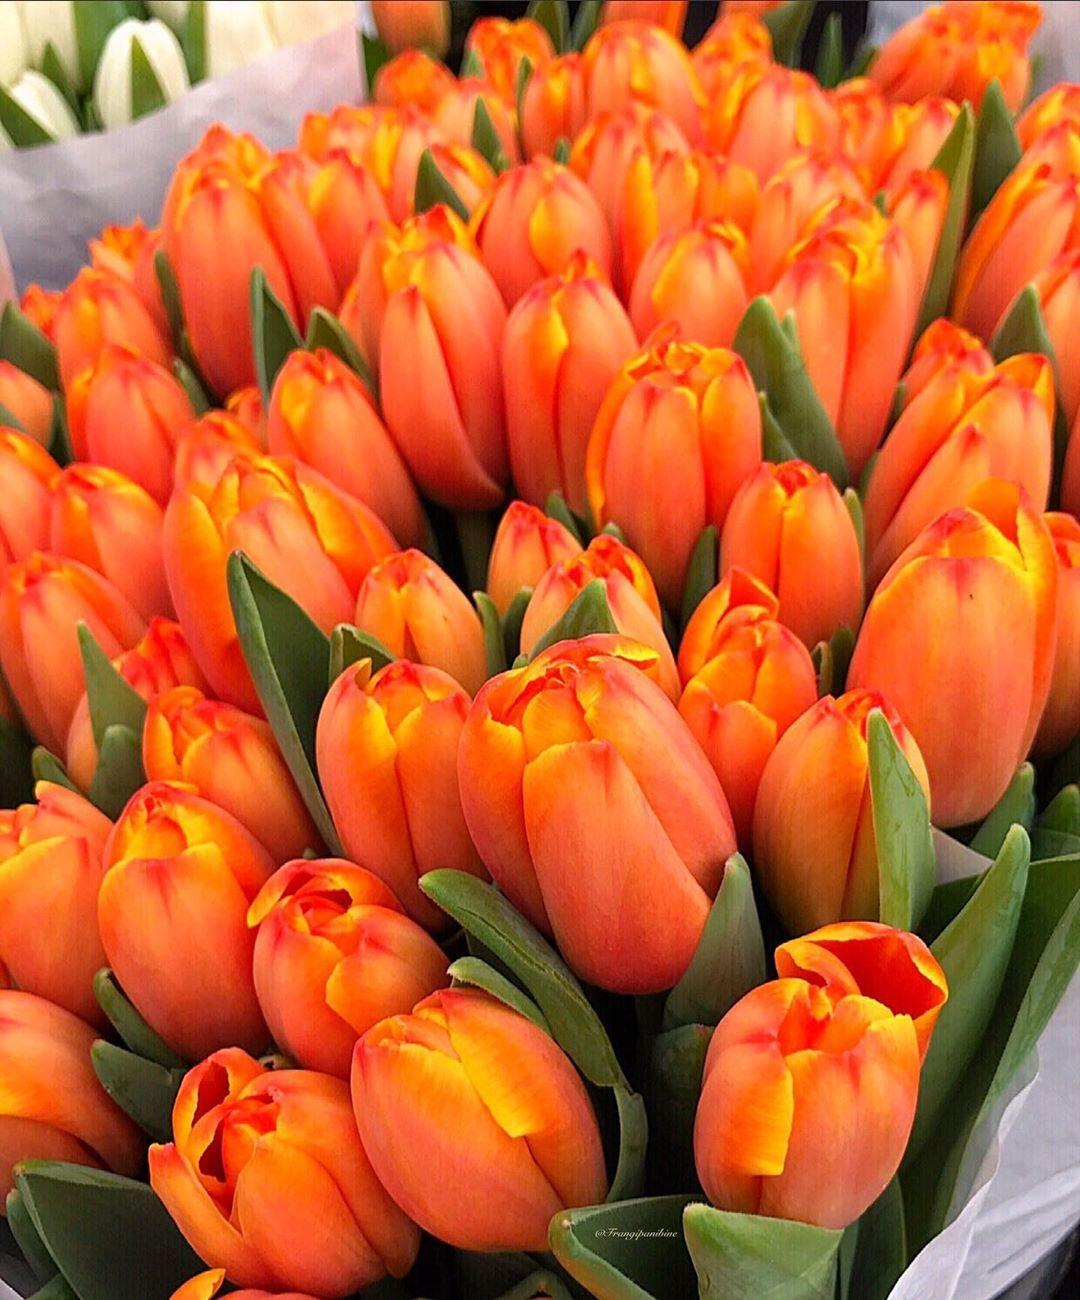 Good Morning Tulips From Amsterdam Have A Nice Thursday My Dear Friends Anzeige Wegen Markennennun Tulips Flowers Tulips Garden Tulips